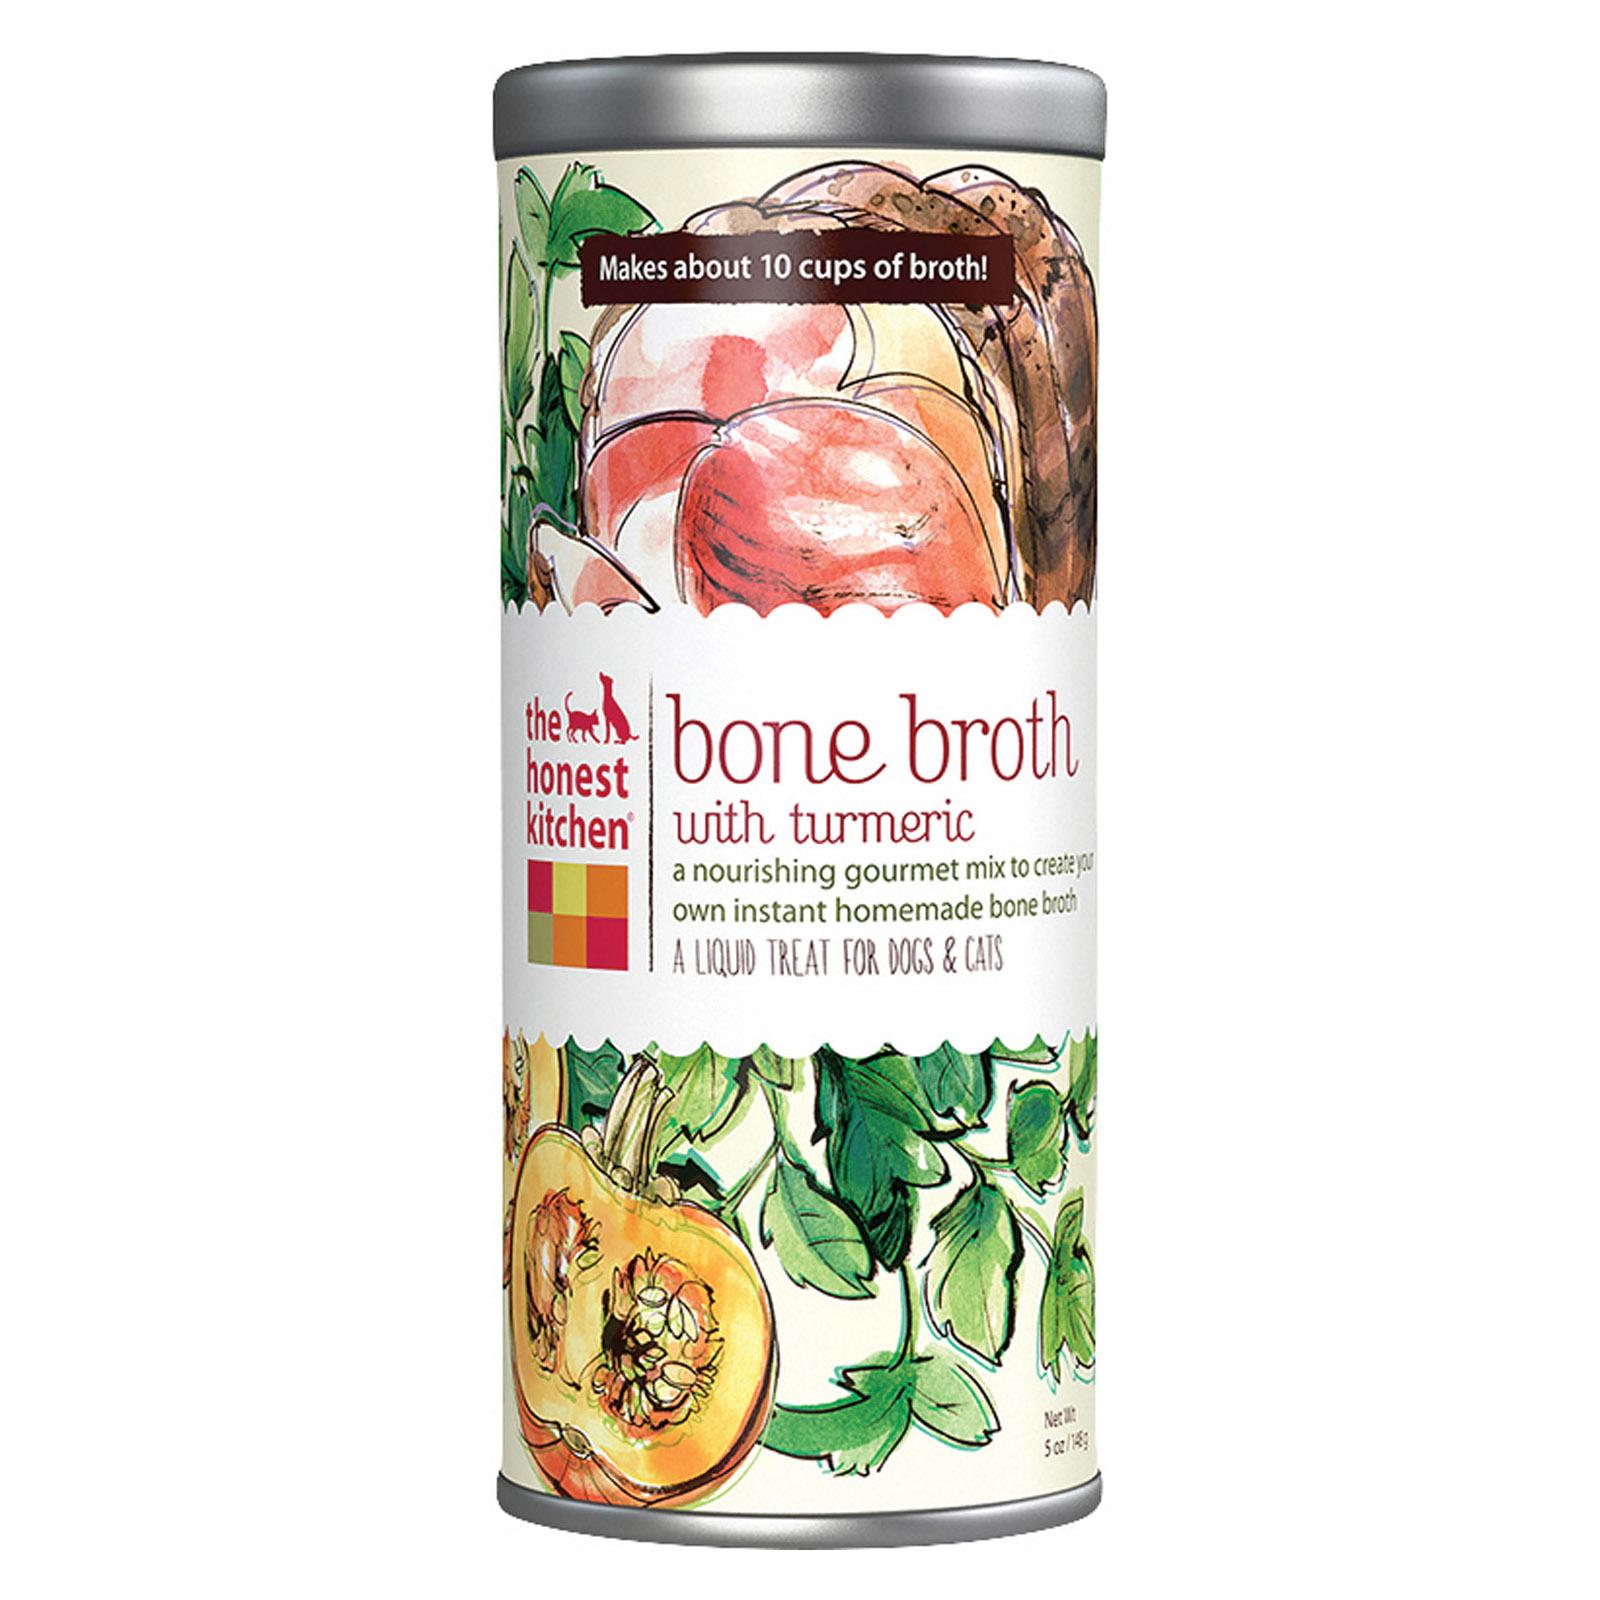 The Honest Kitchen Liquid Treat - Bone Broth - Dog and Cat - Case of 6 - 5 oz